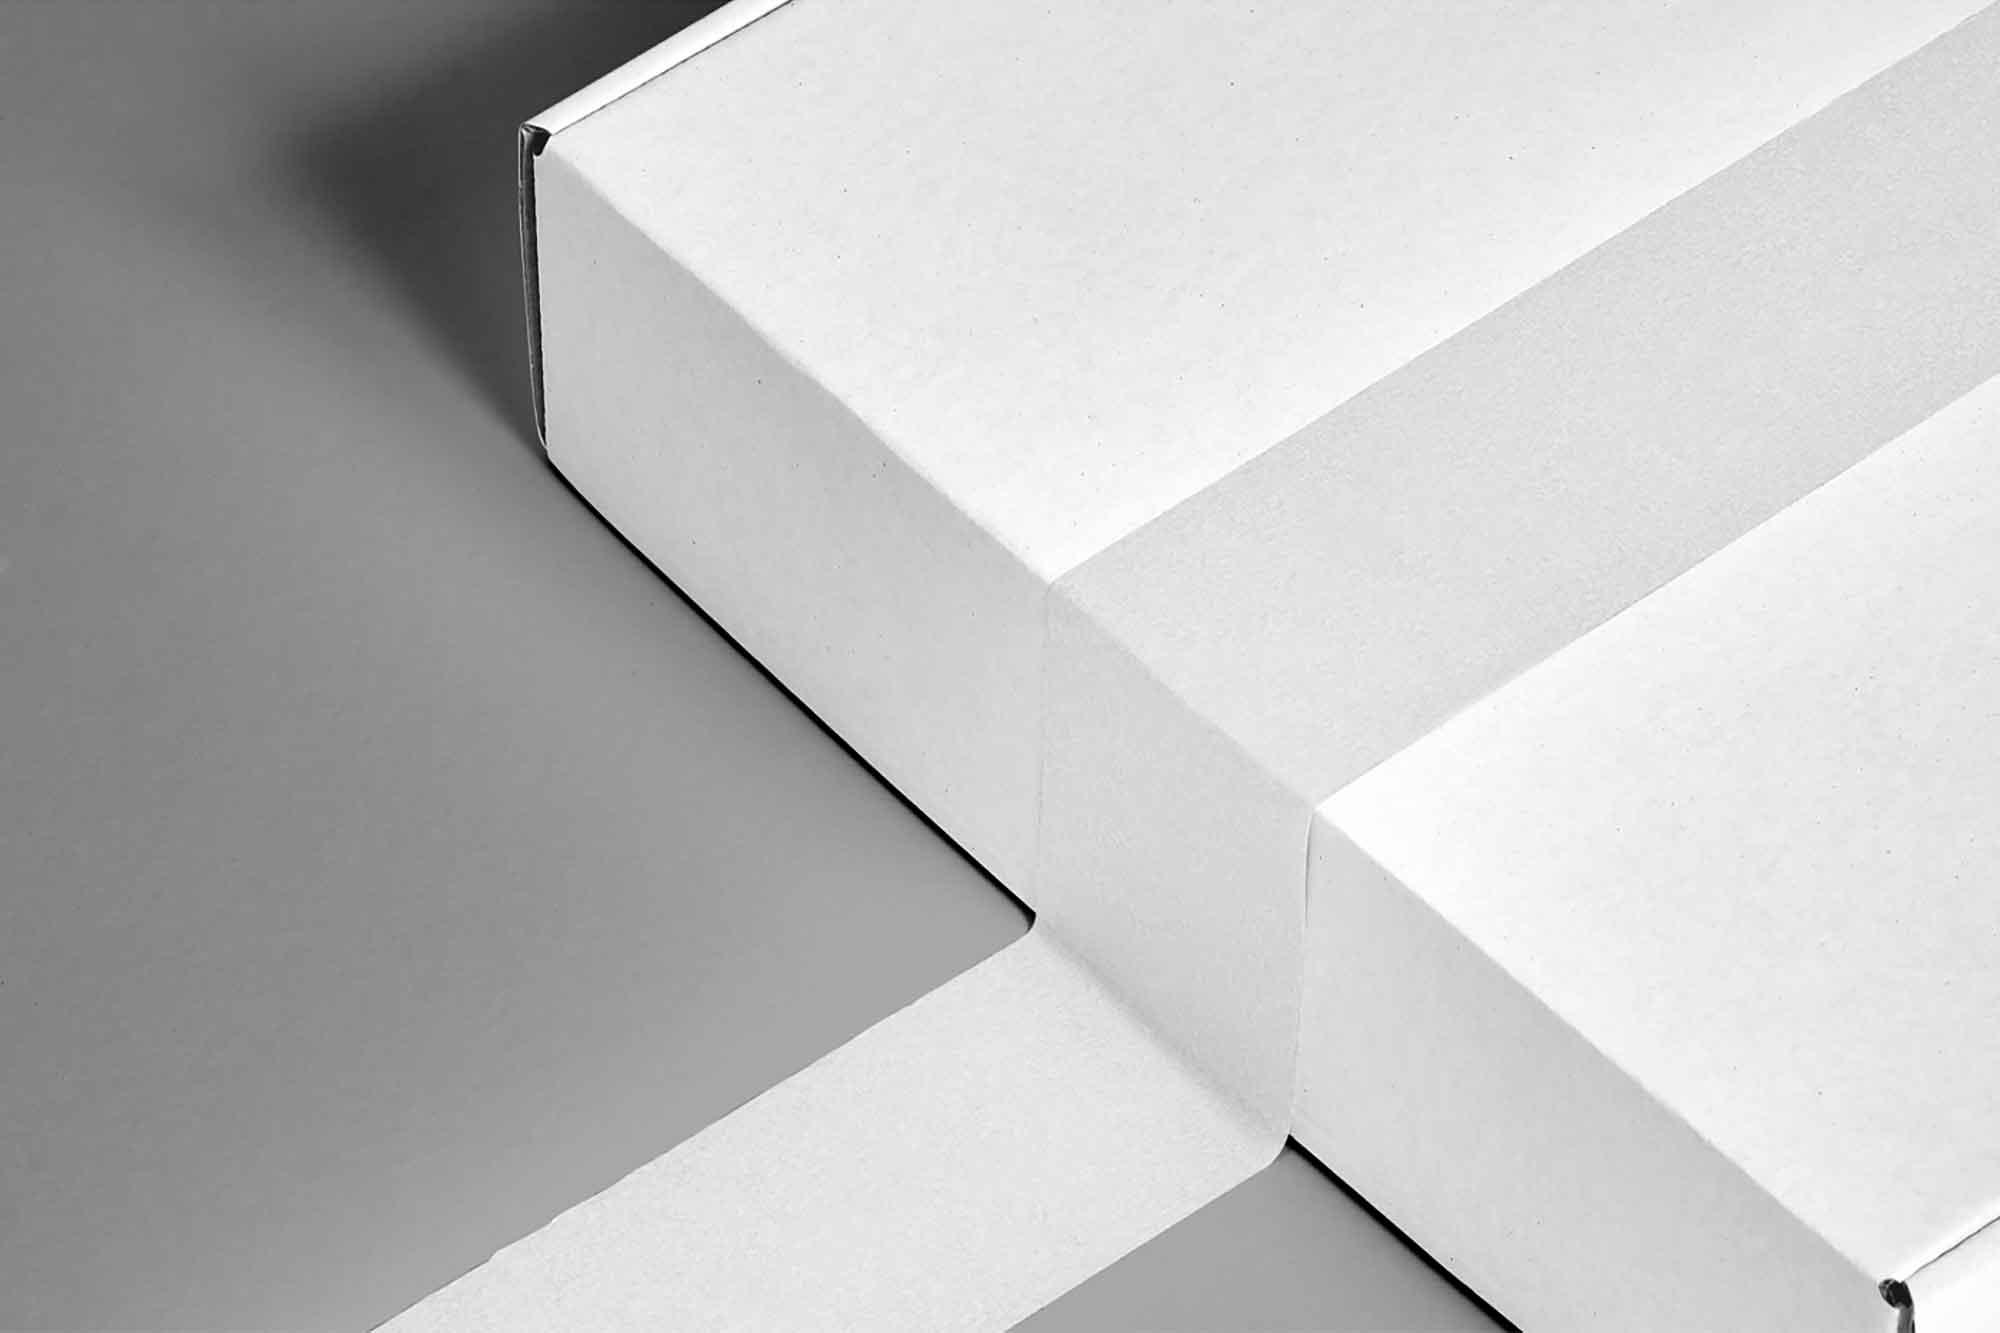 Box with Tape Mockup 2